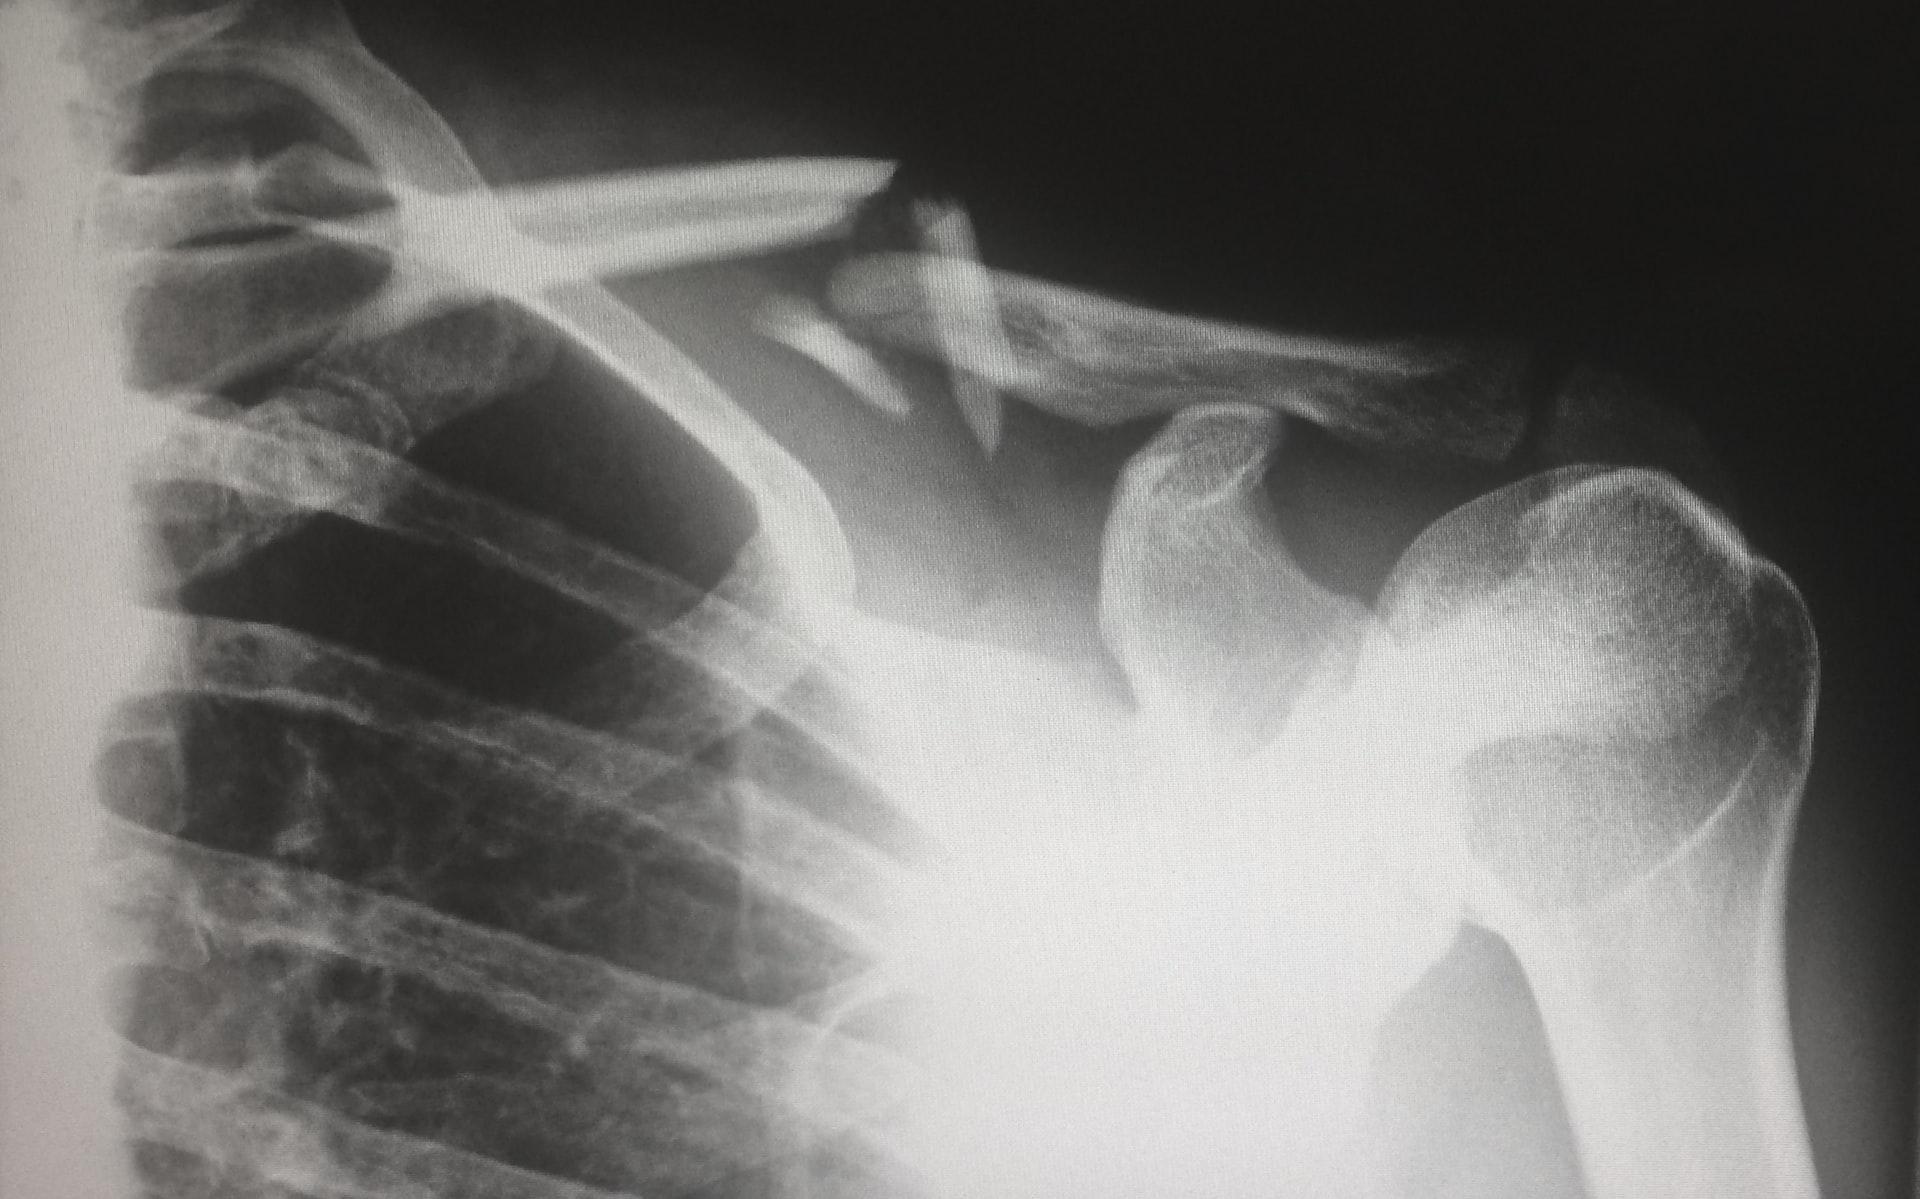 x-ray broken bone, arizona statute of limitations personal injury